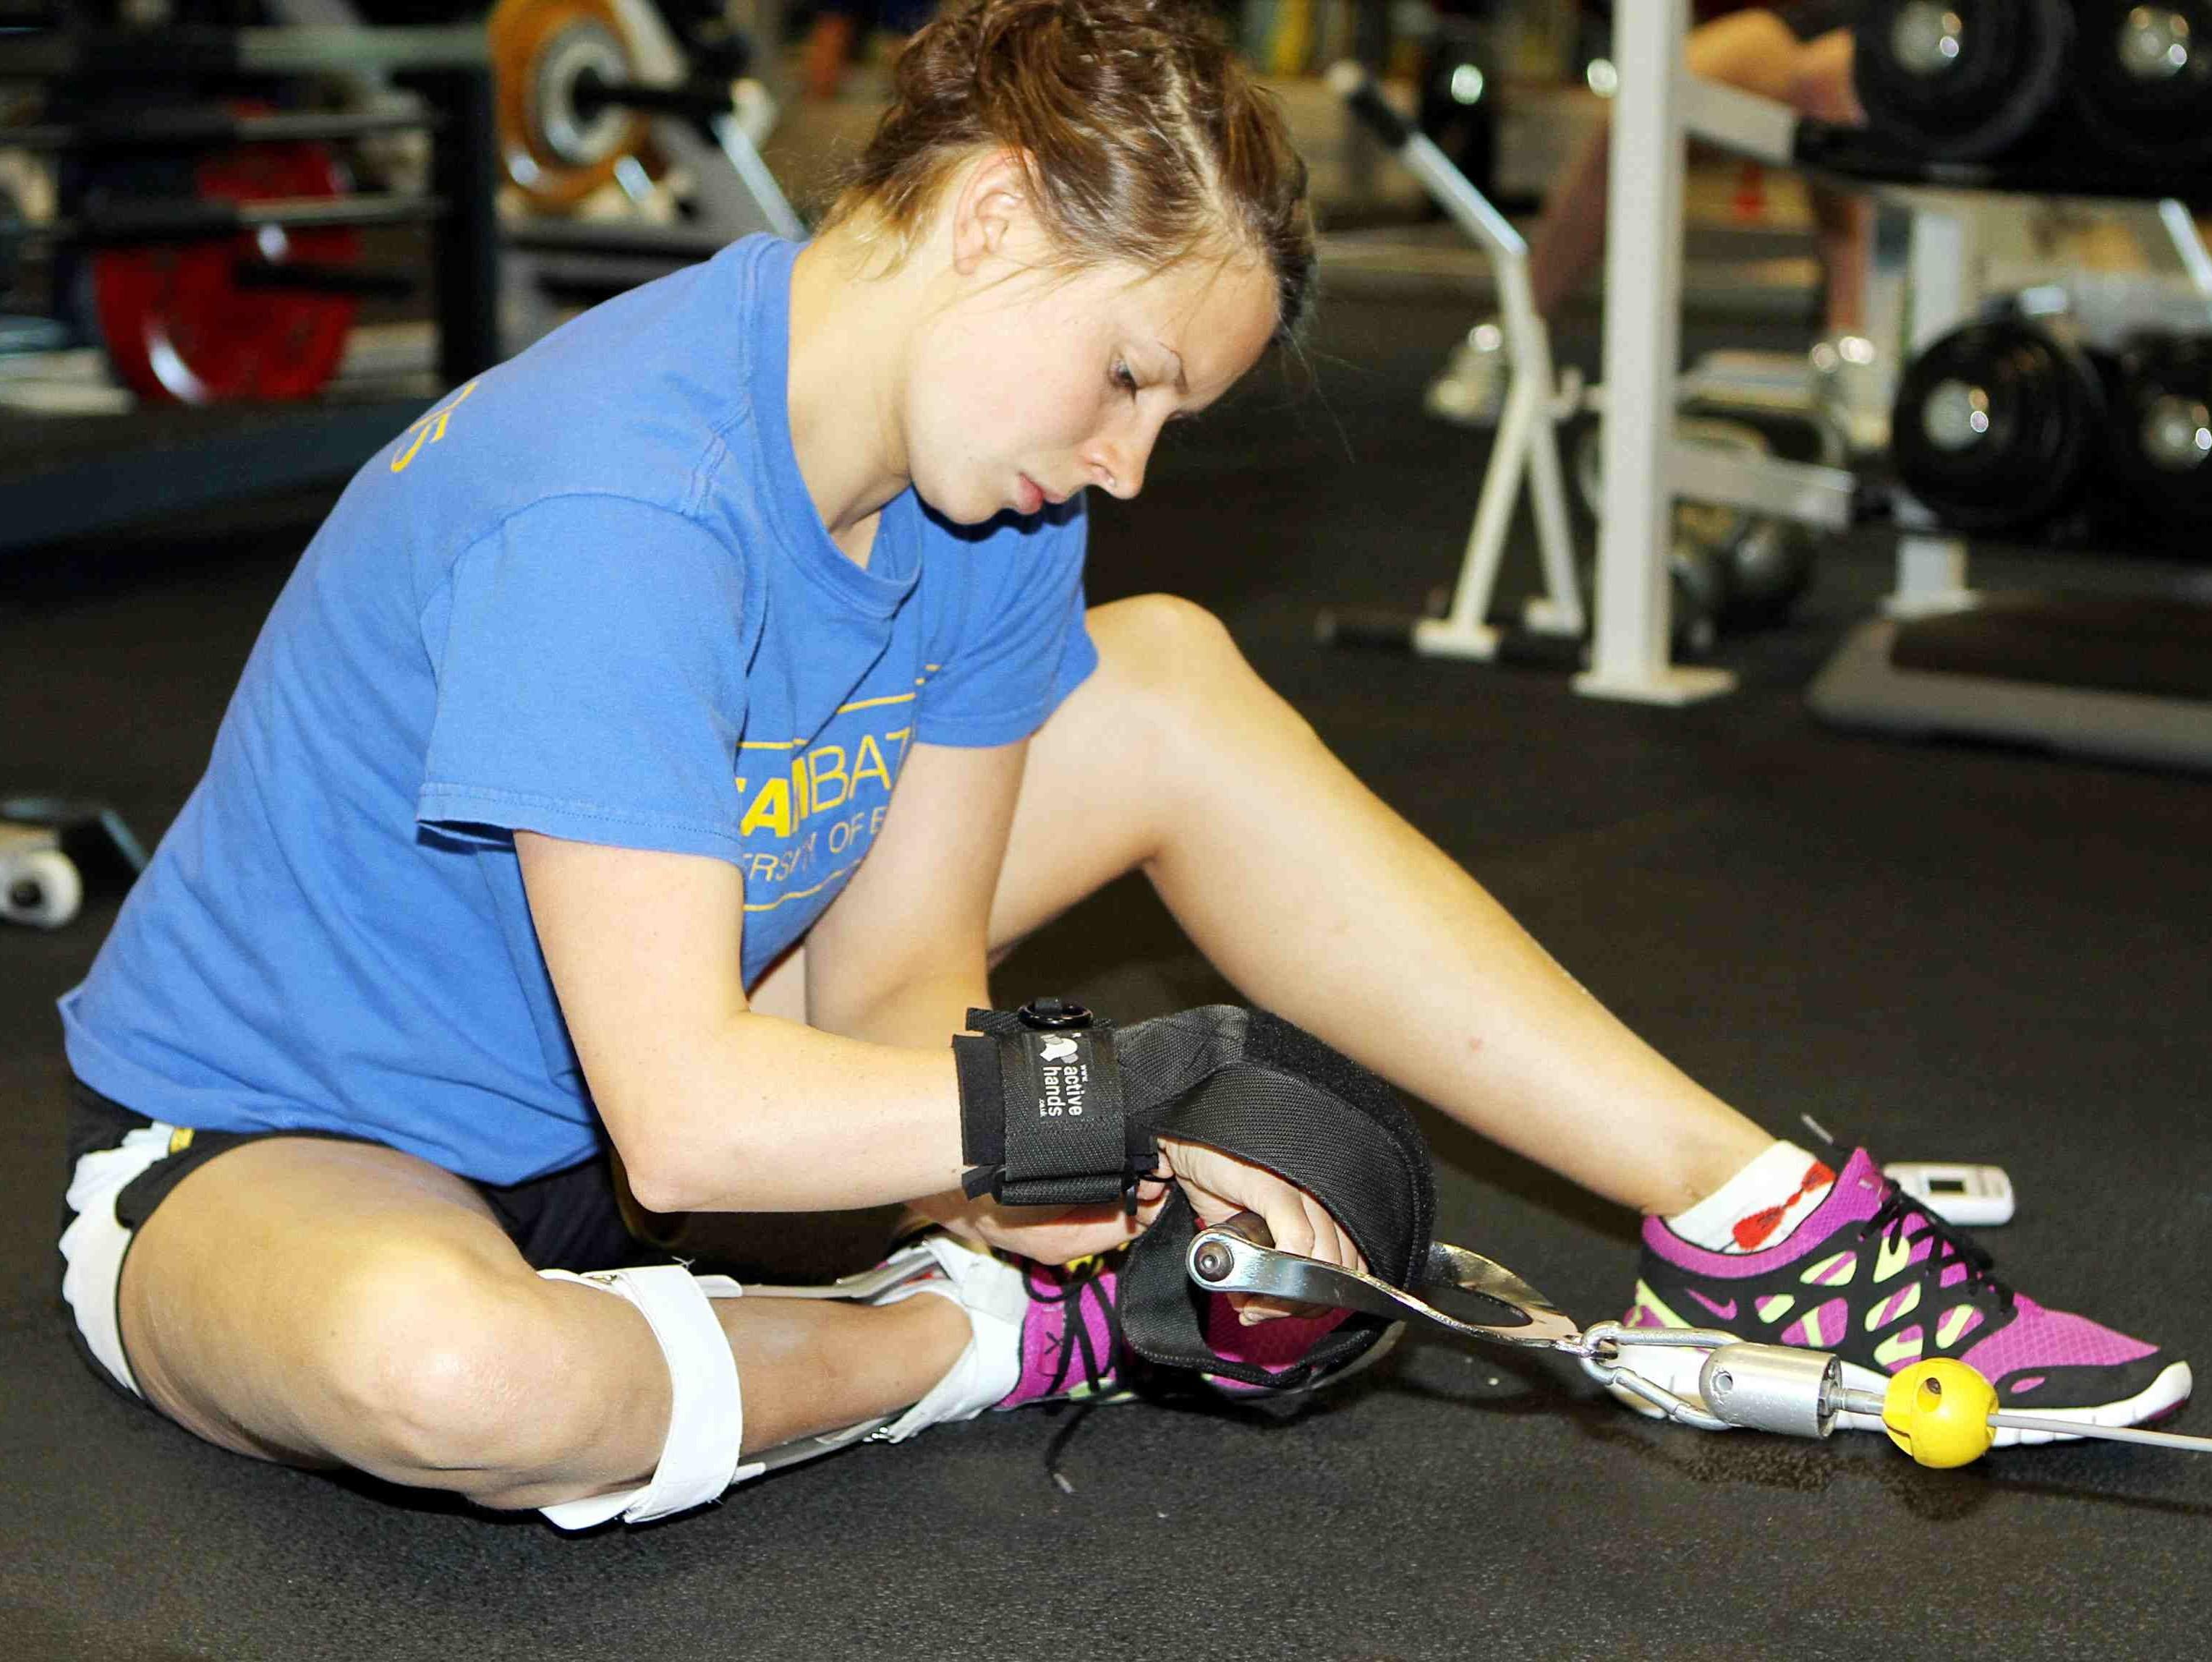 Liz Johnson using General Purpose gripping aids in gym